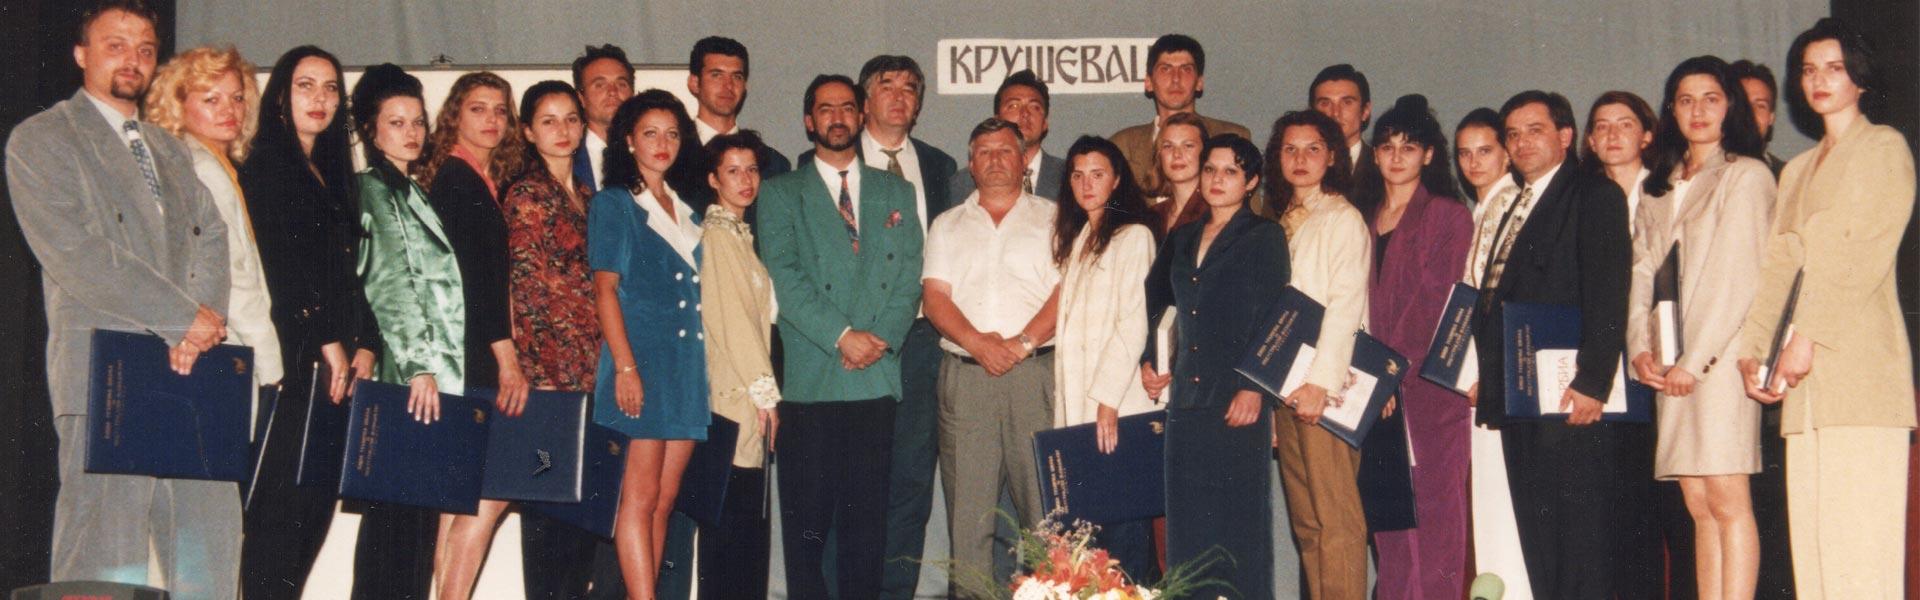 prva-generacija-visoka-poslovna-skola-strukovnih-studija-krusevac